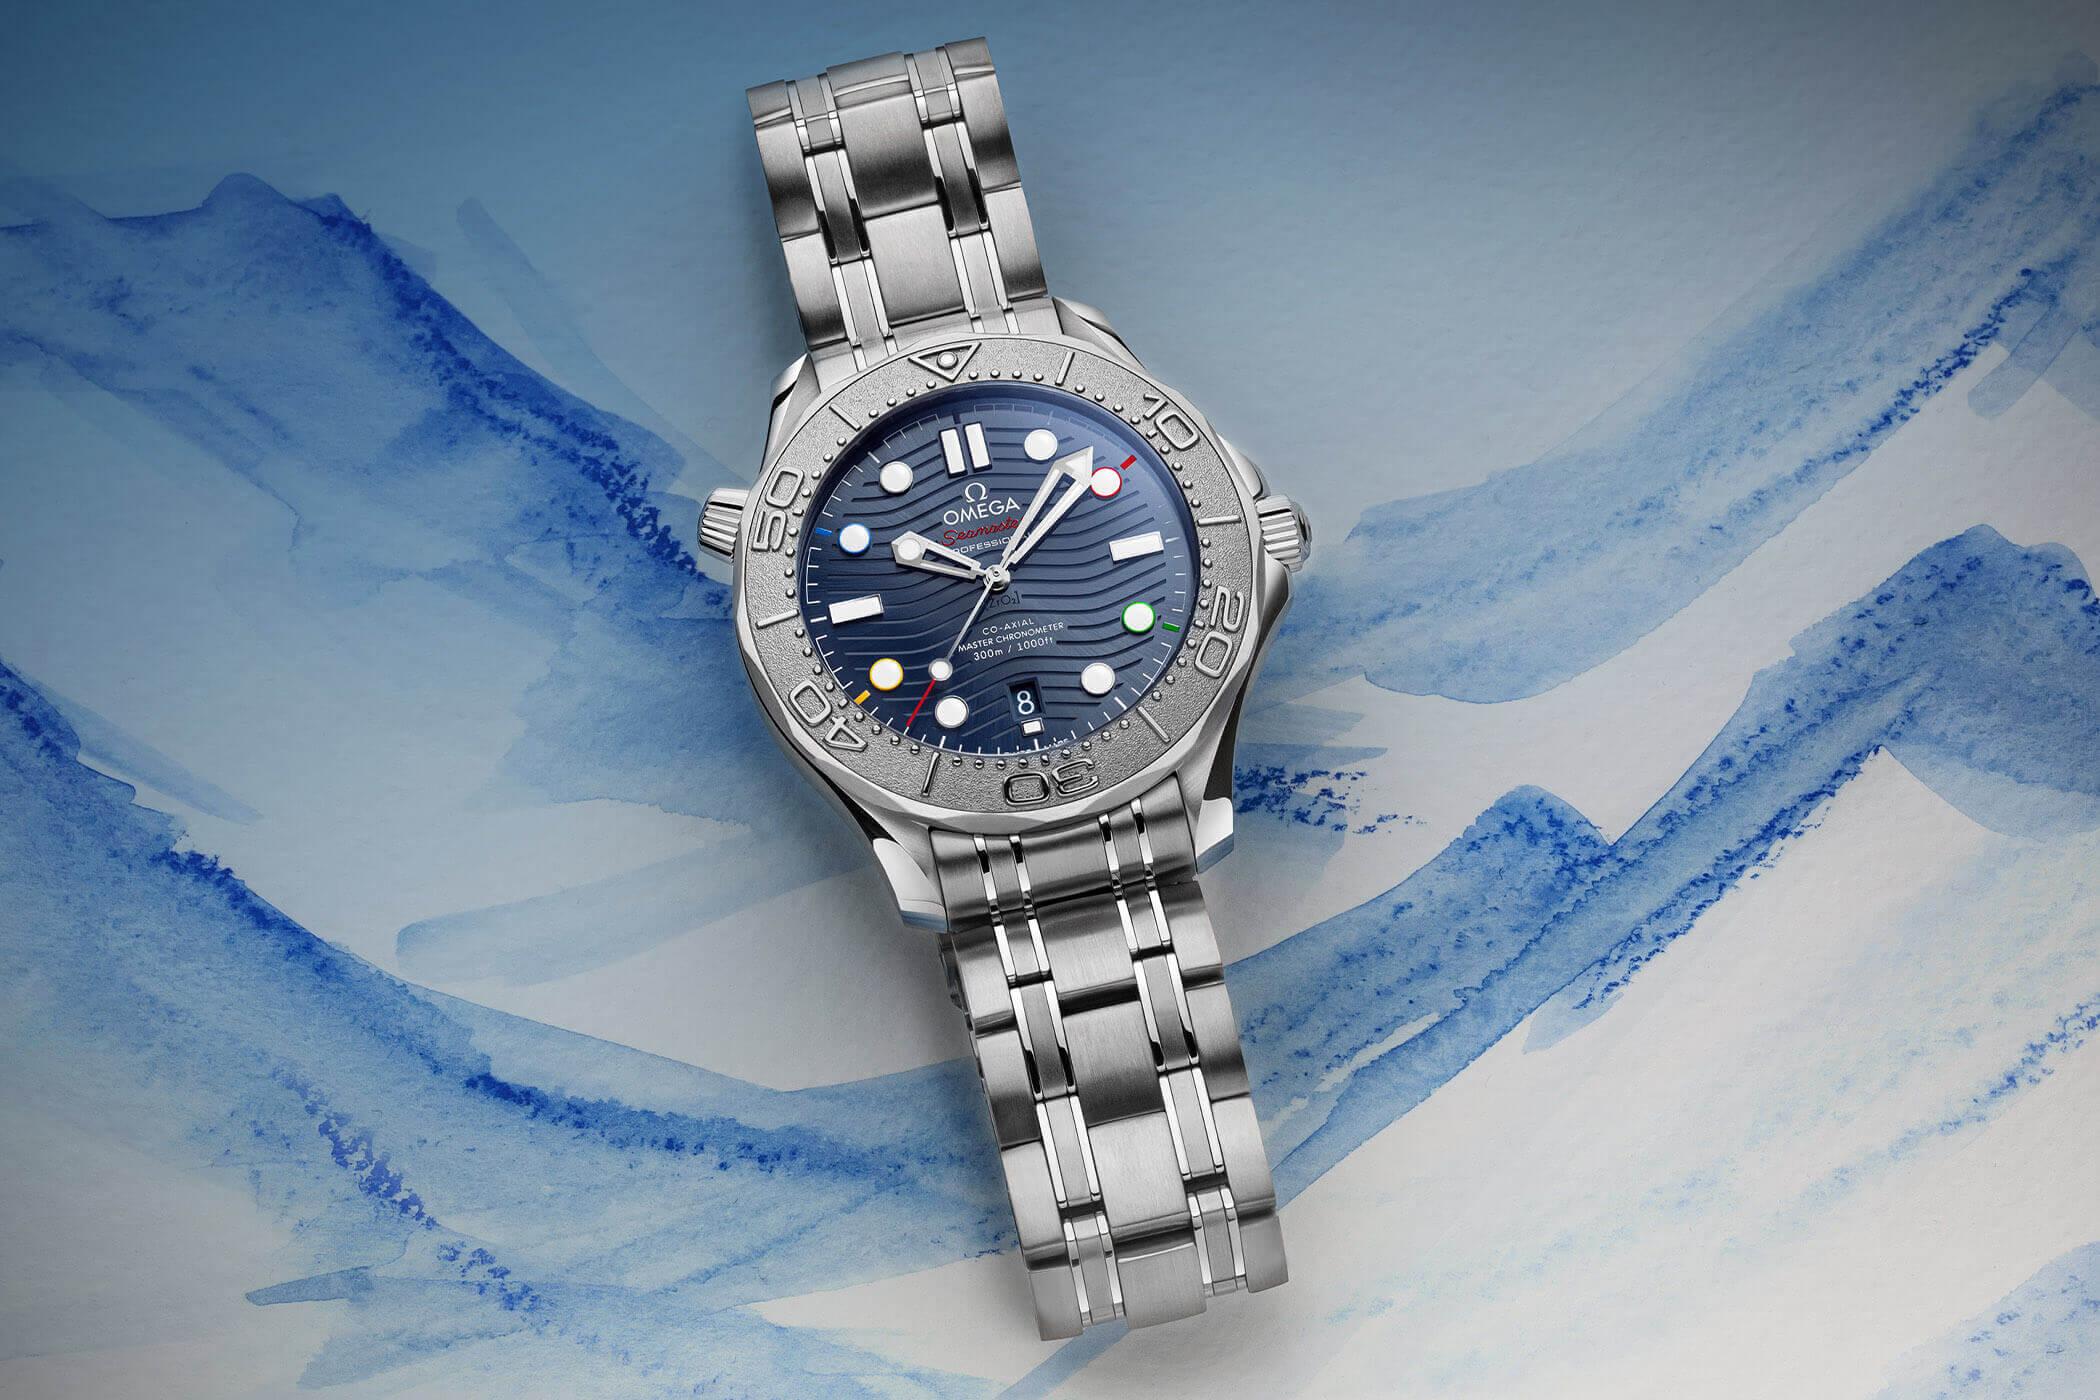 omega seamaster diver 300 beijing saat haberleri